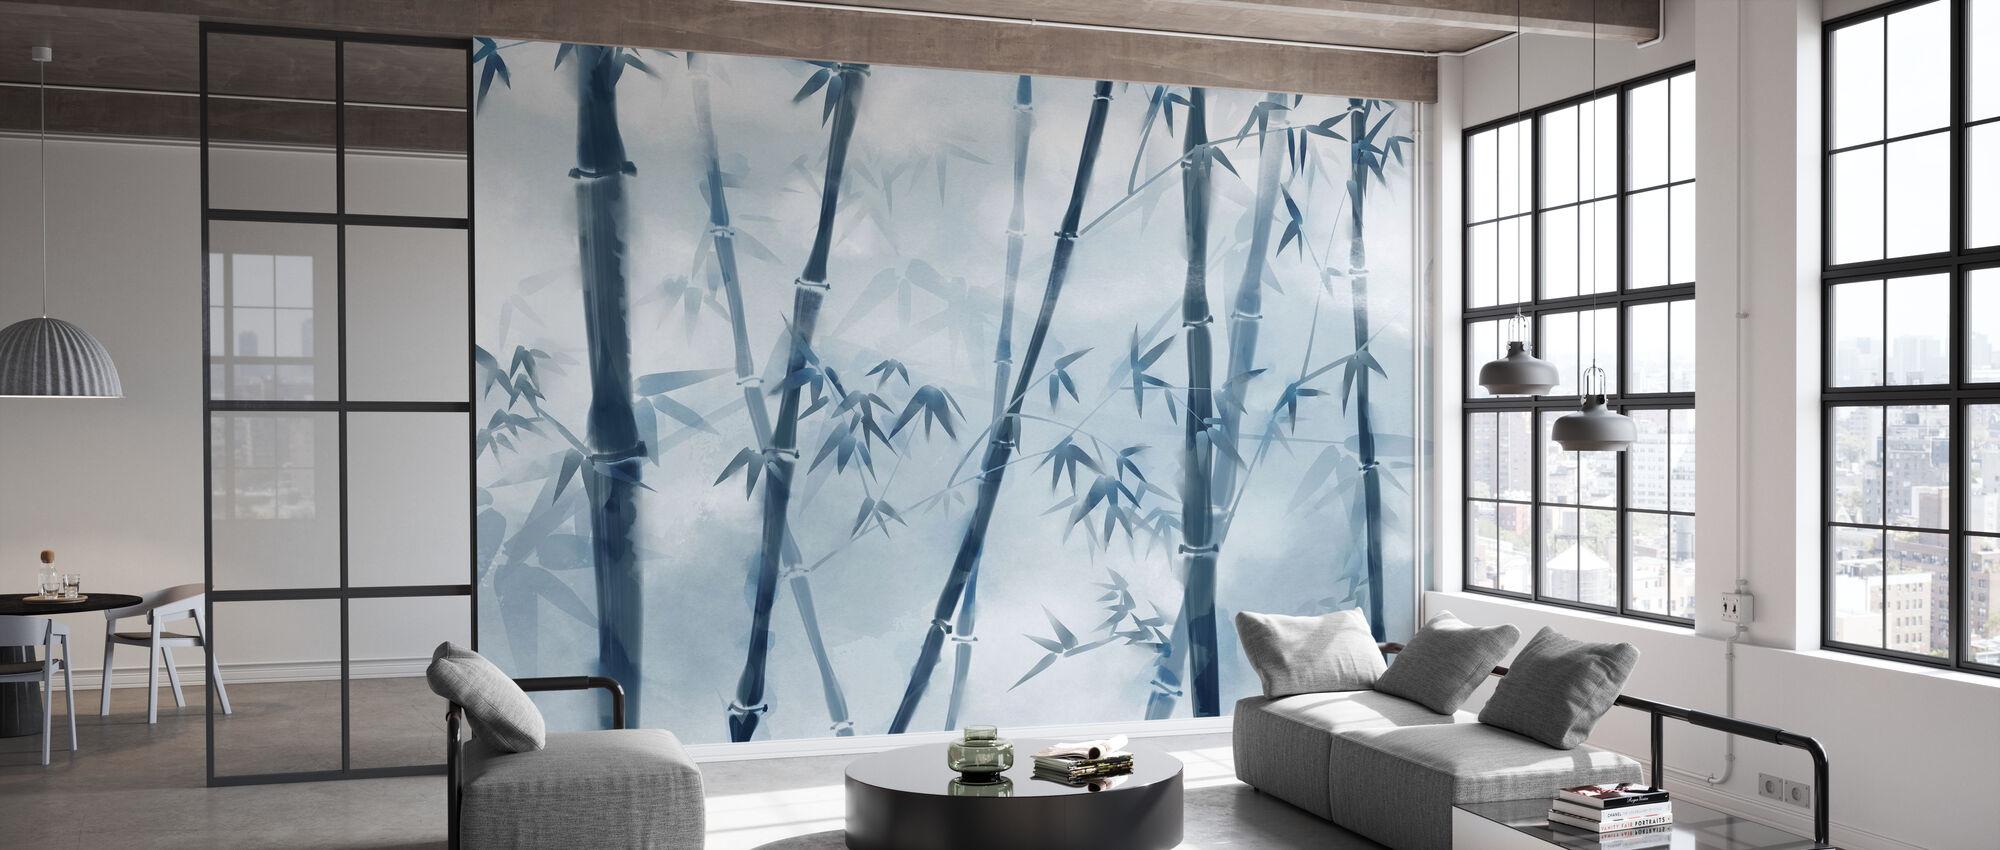 Bambu valaiseva - Tapetti - Toimisto